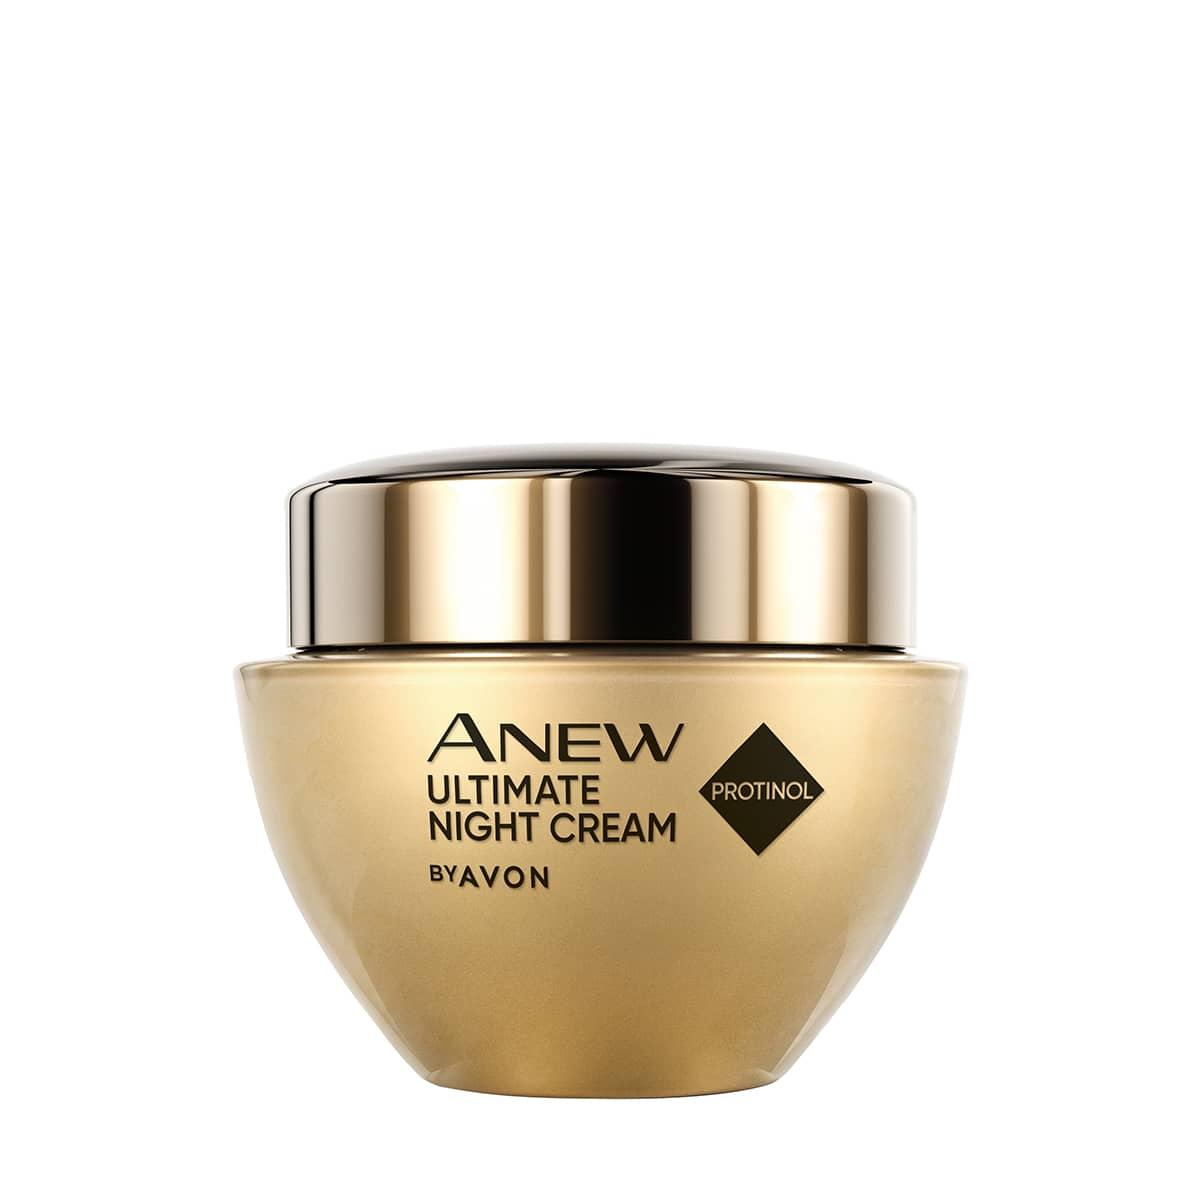 Anew Ultimate Night Restoring Cream 1387103 50ml